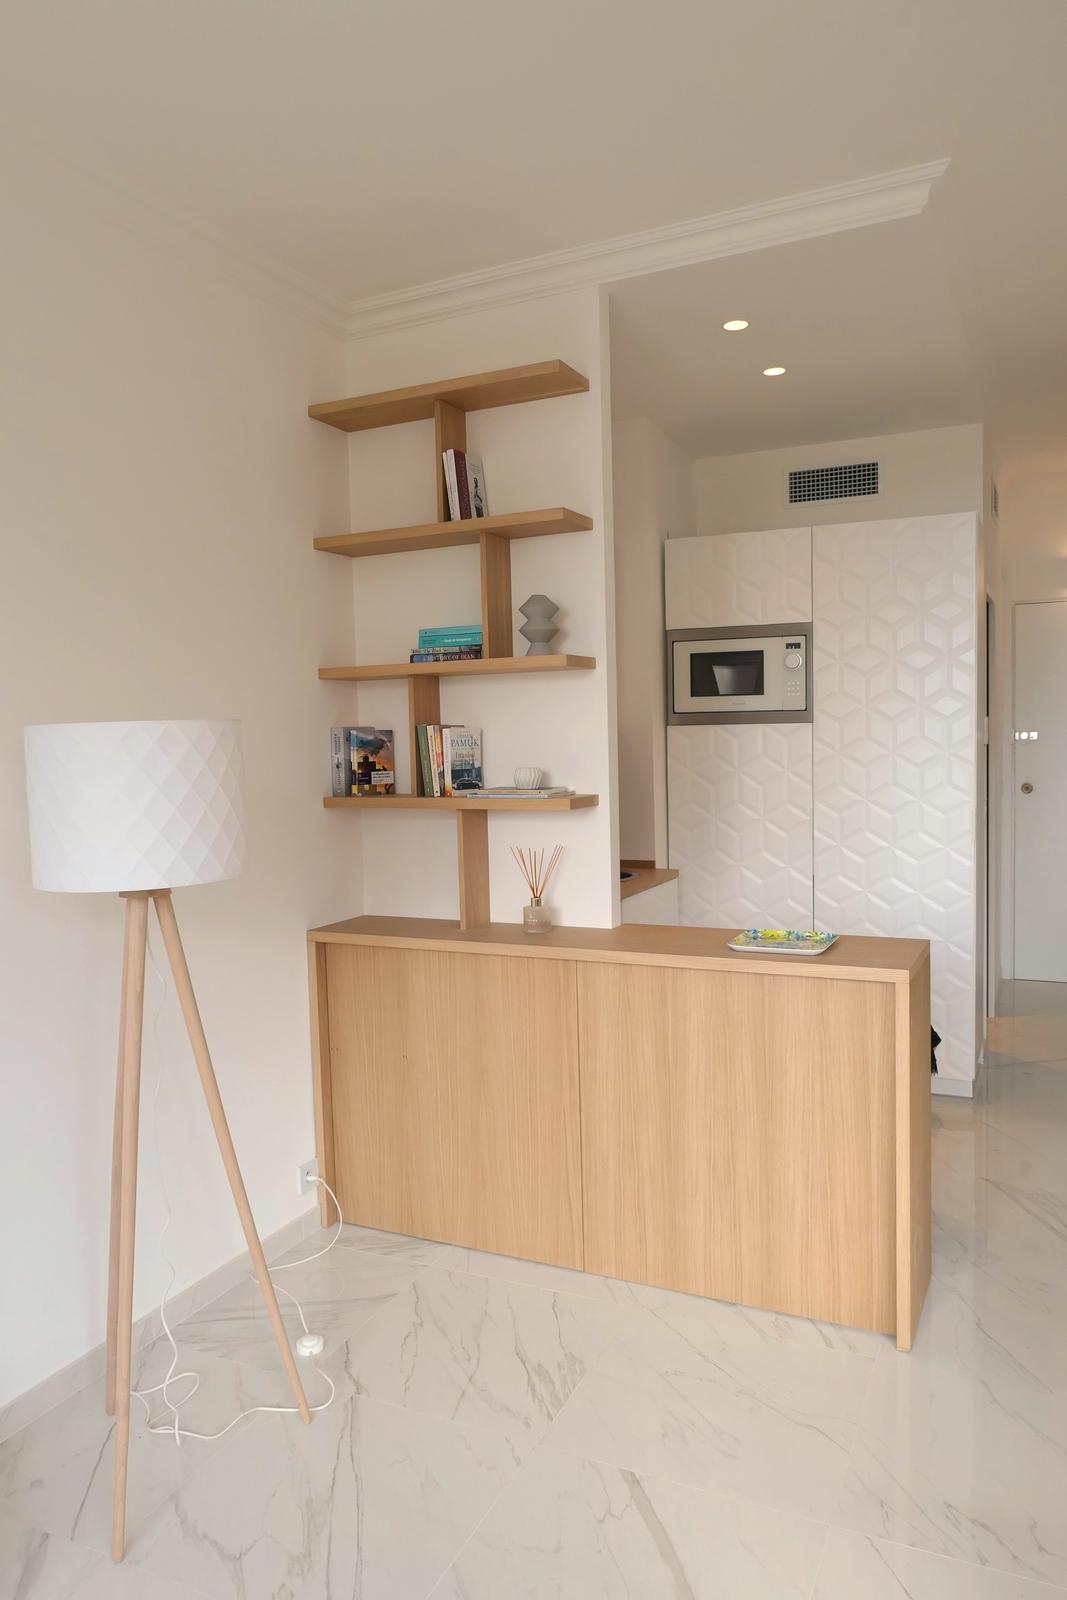 BEACH AREA : NEW STUDIO IN PRESTIGIOUS RESIDENCE - Offices for sale in Monaco